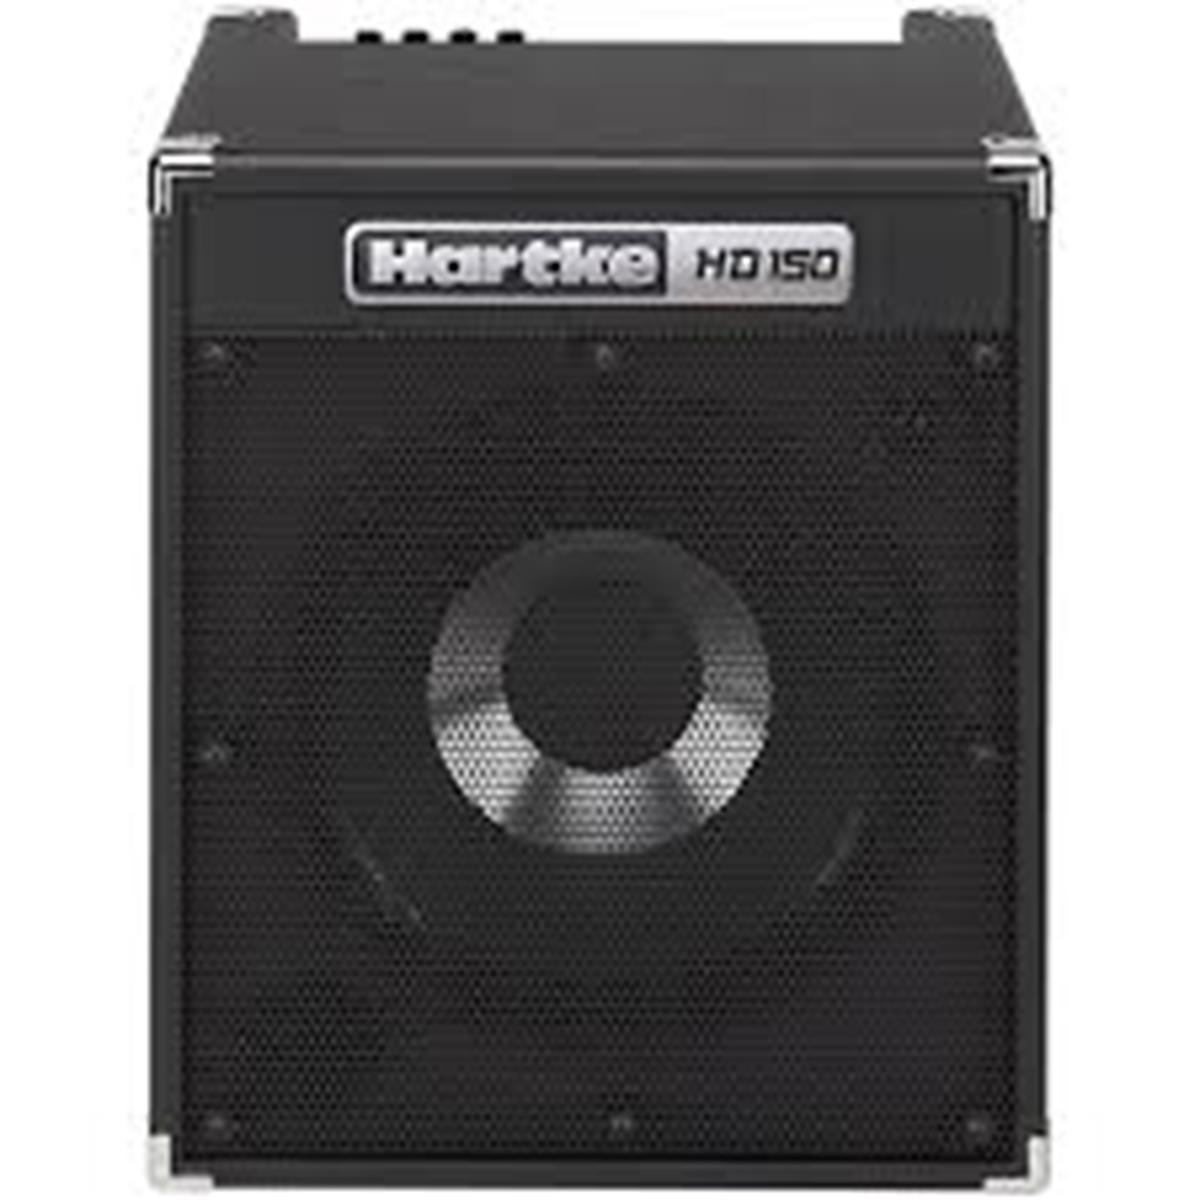 Hartke-HD150-1x15-150W-sku-2441269439004